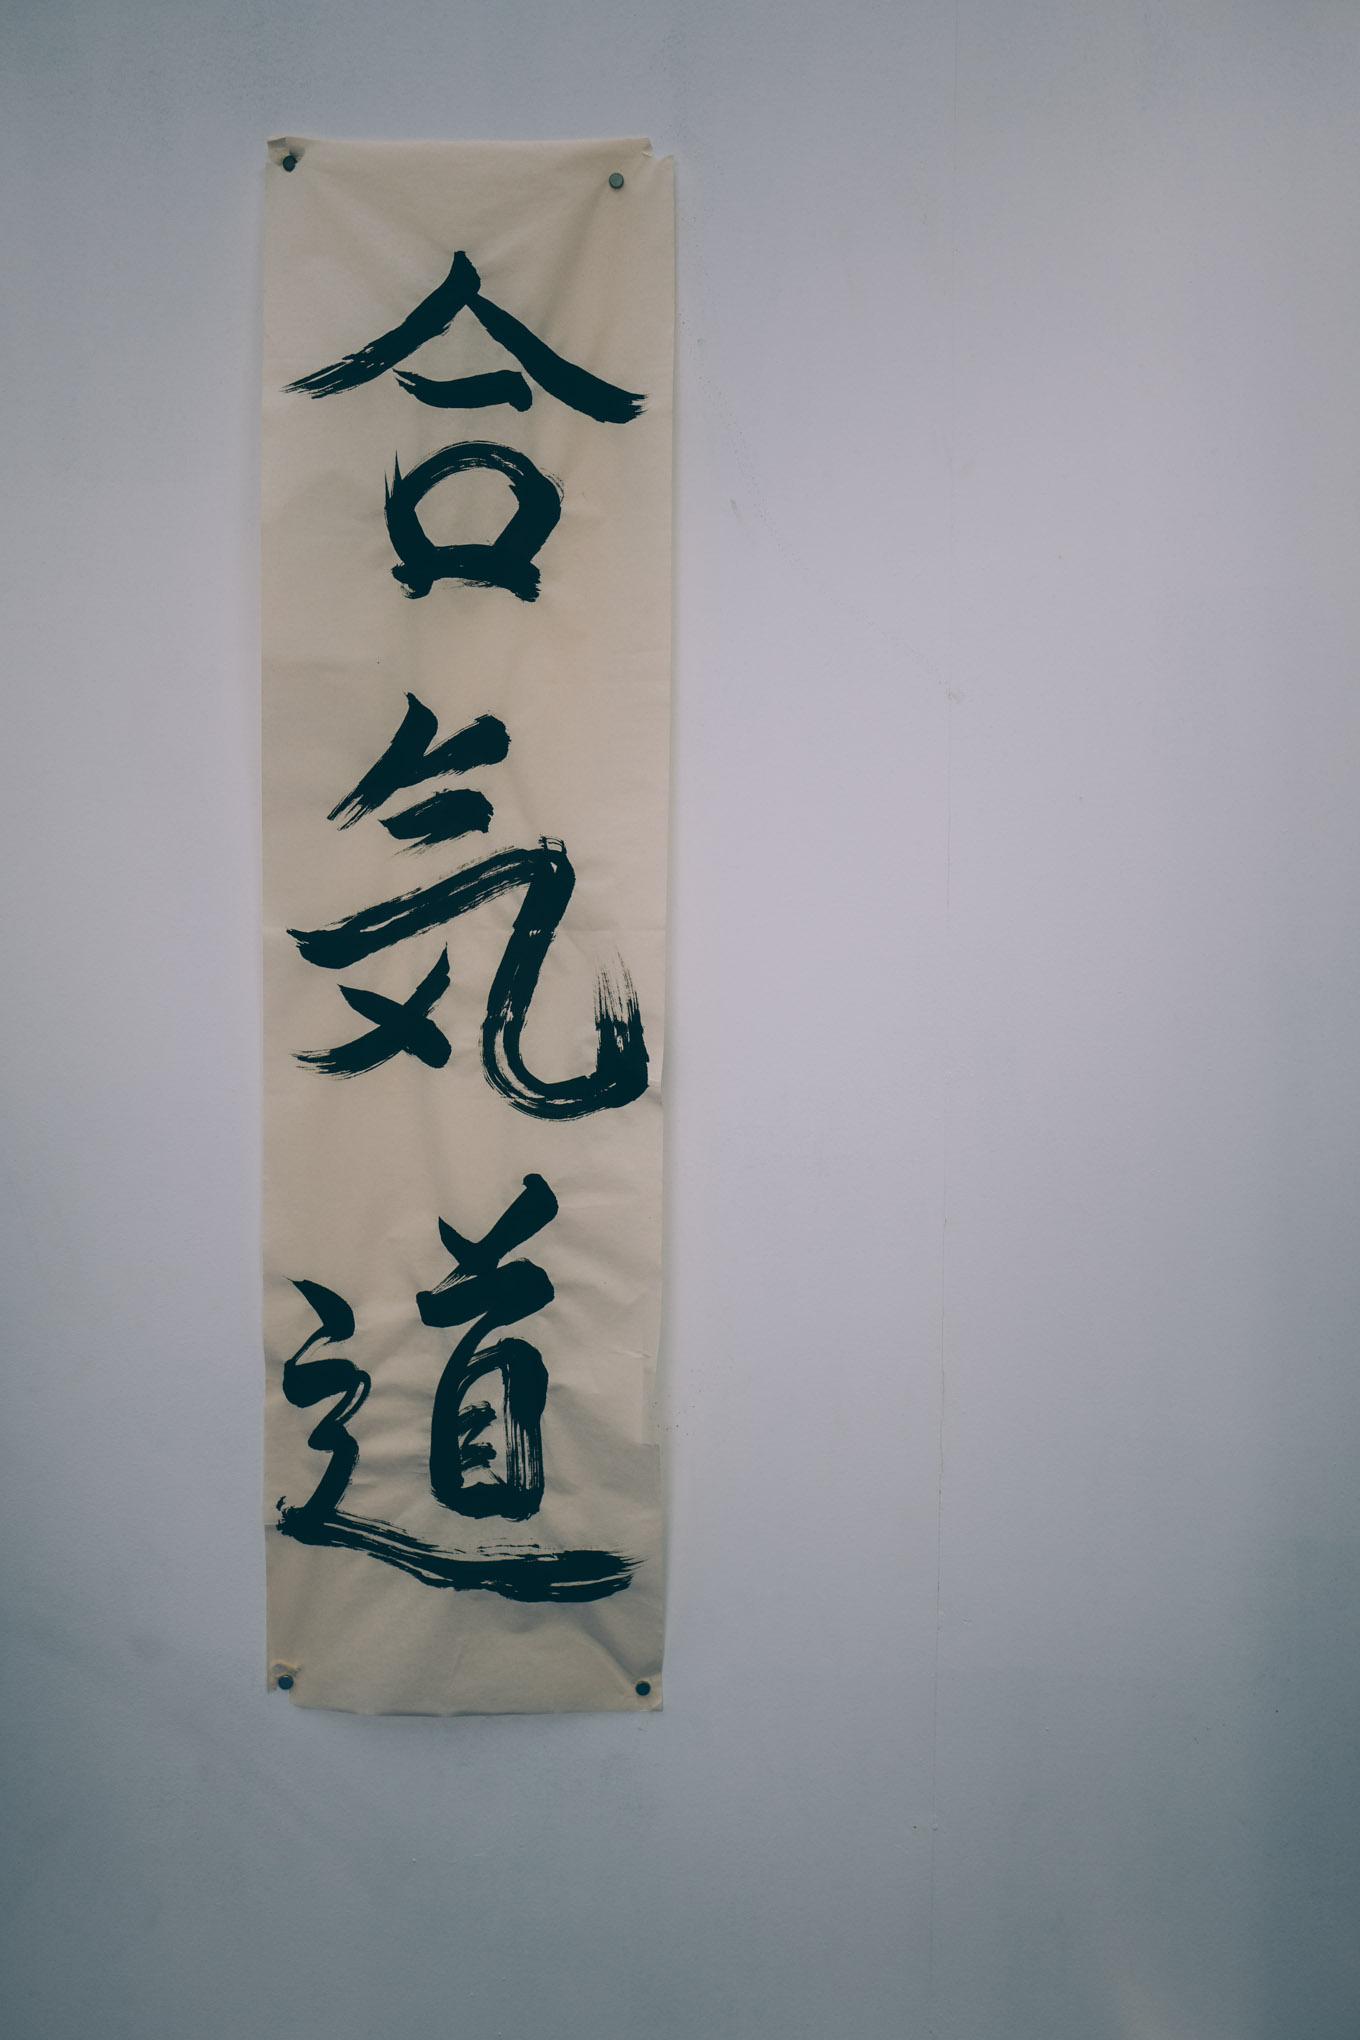 The kanji for Aikido: 合気道